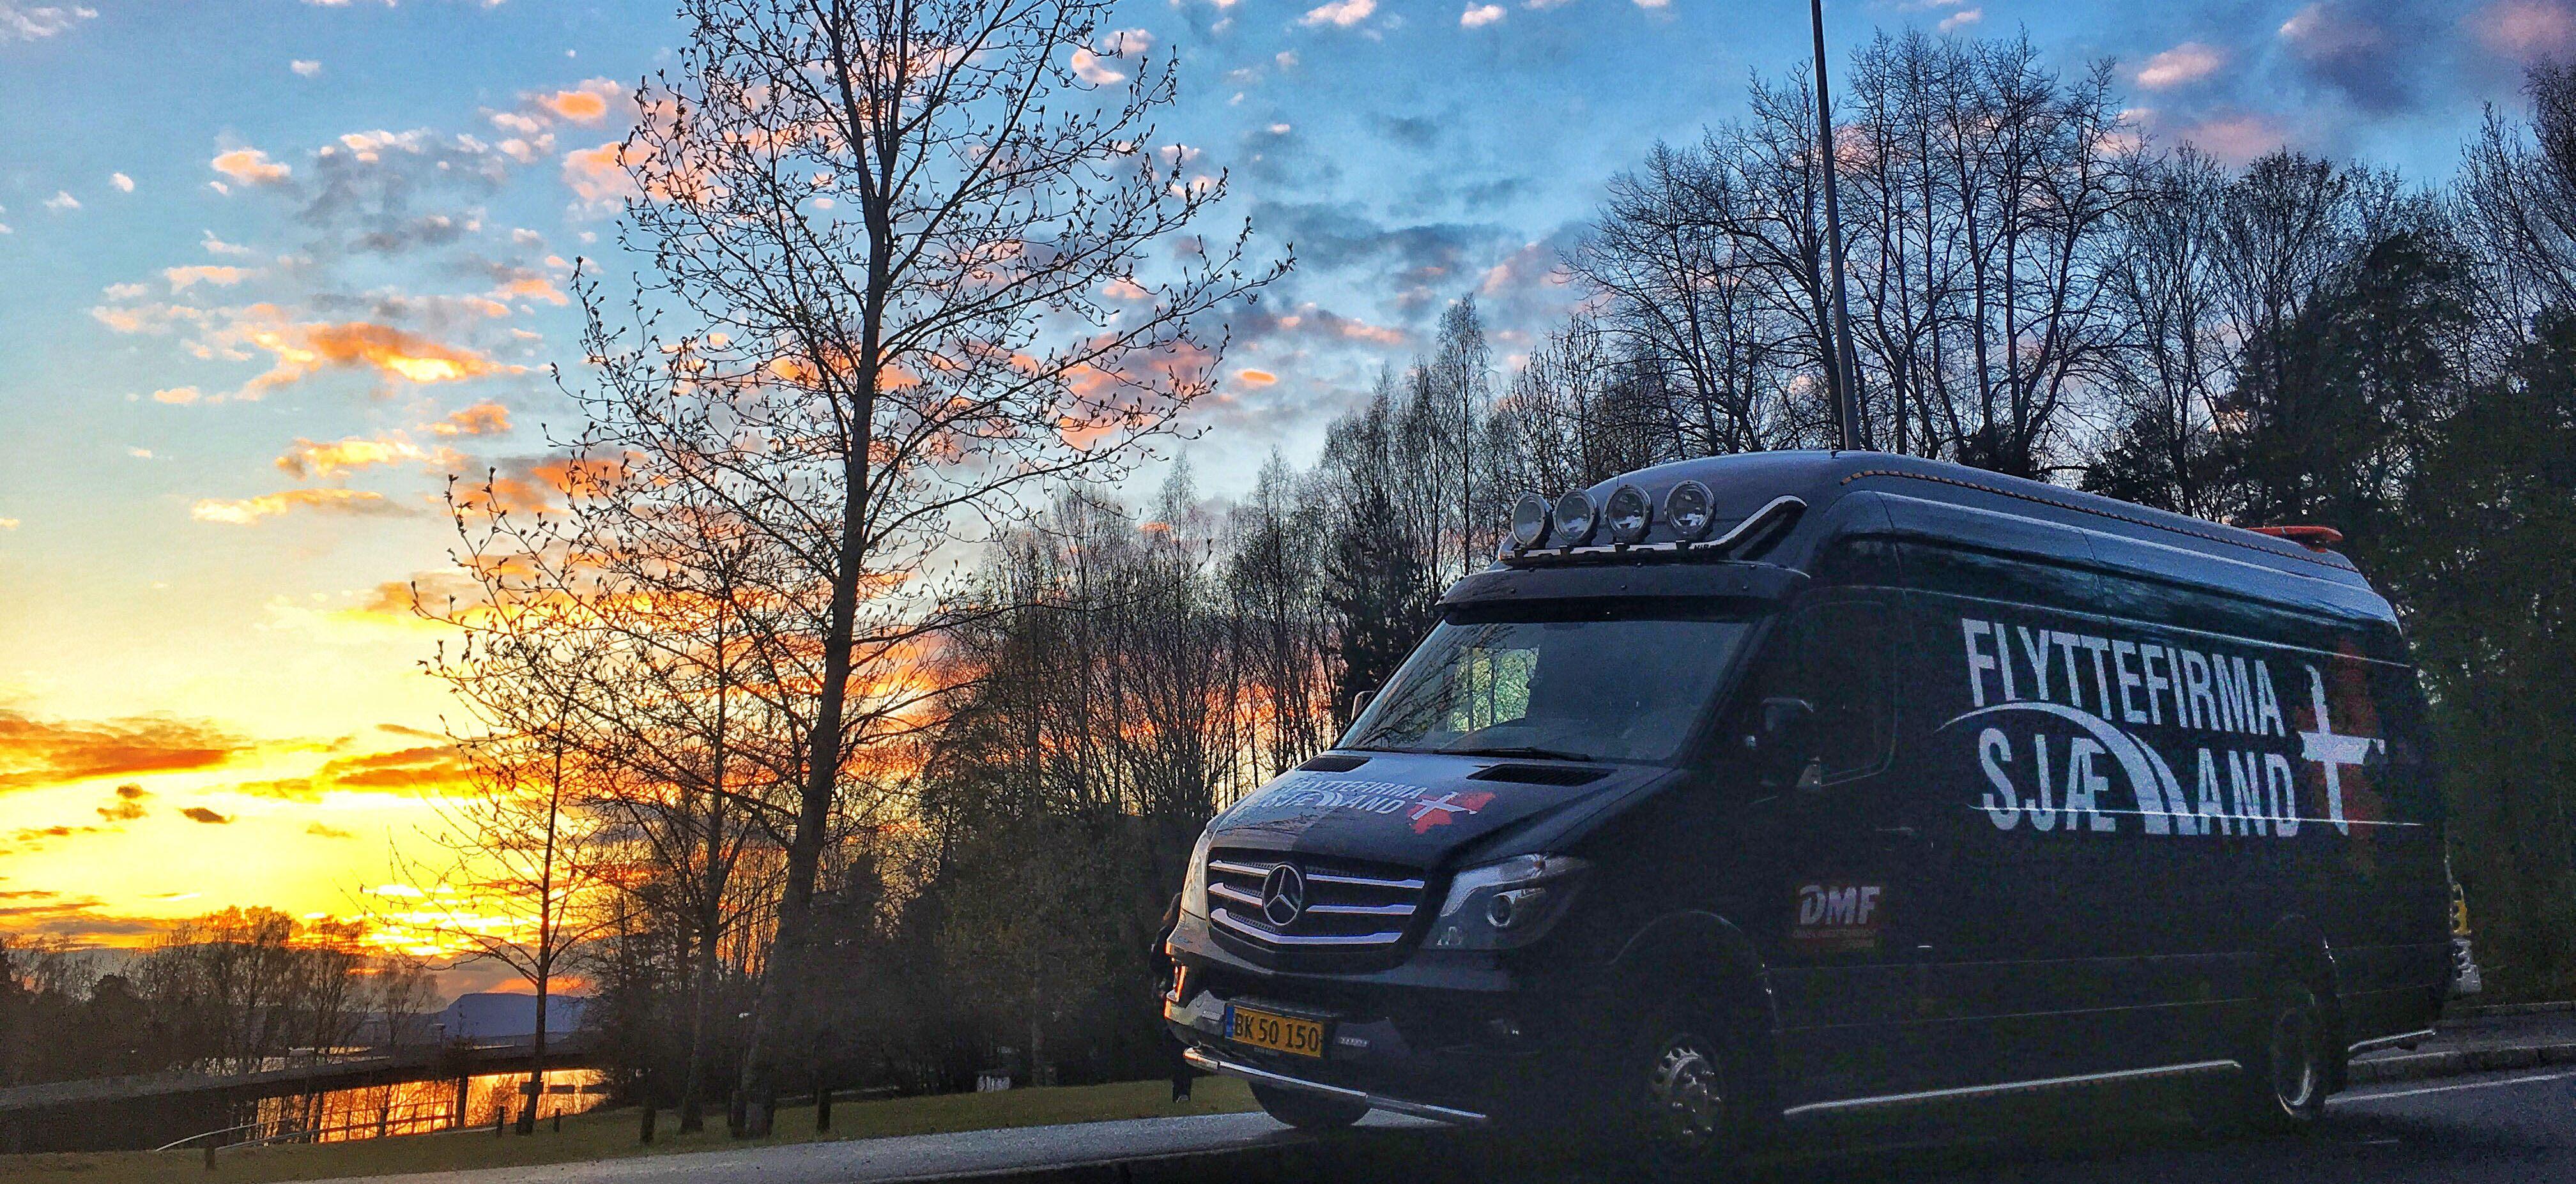 flyttebil fra Flyttefirma Sjælland i Norge